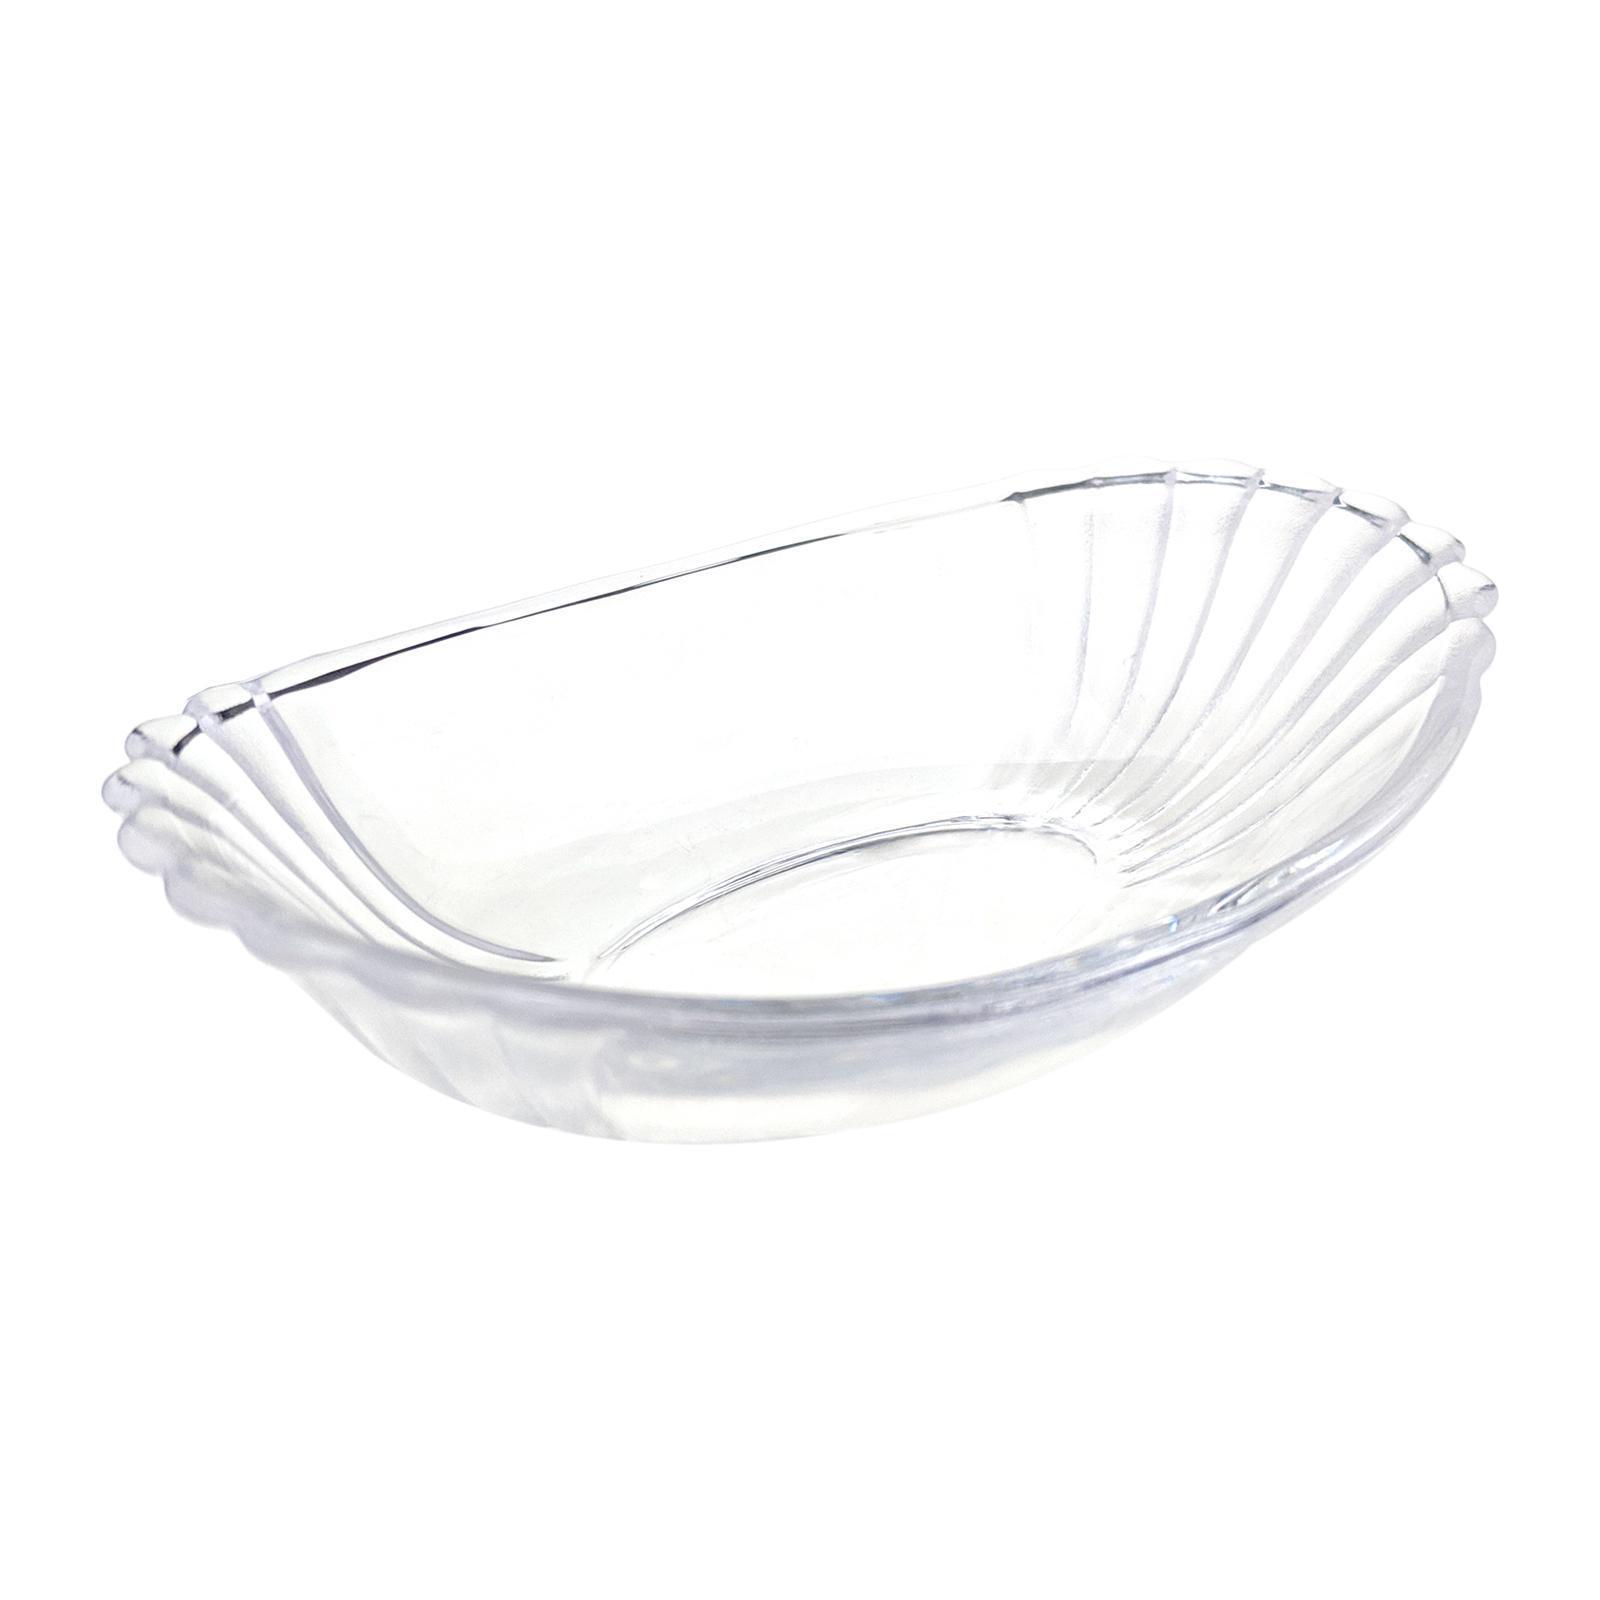 Soga Flandre Oval Glass Dish 4.5 6-PCS Set